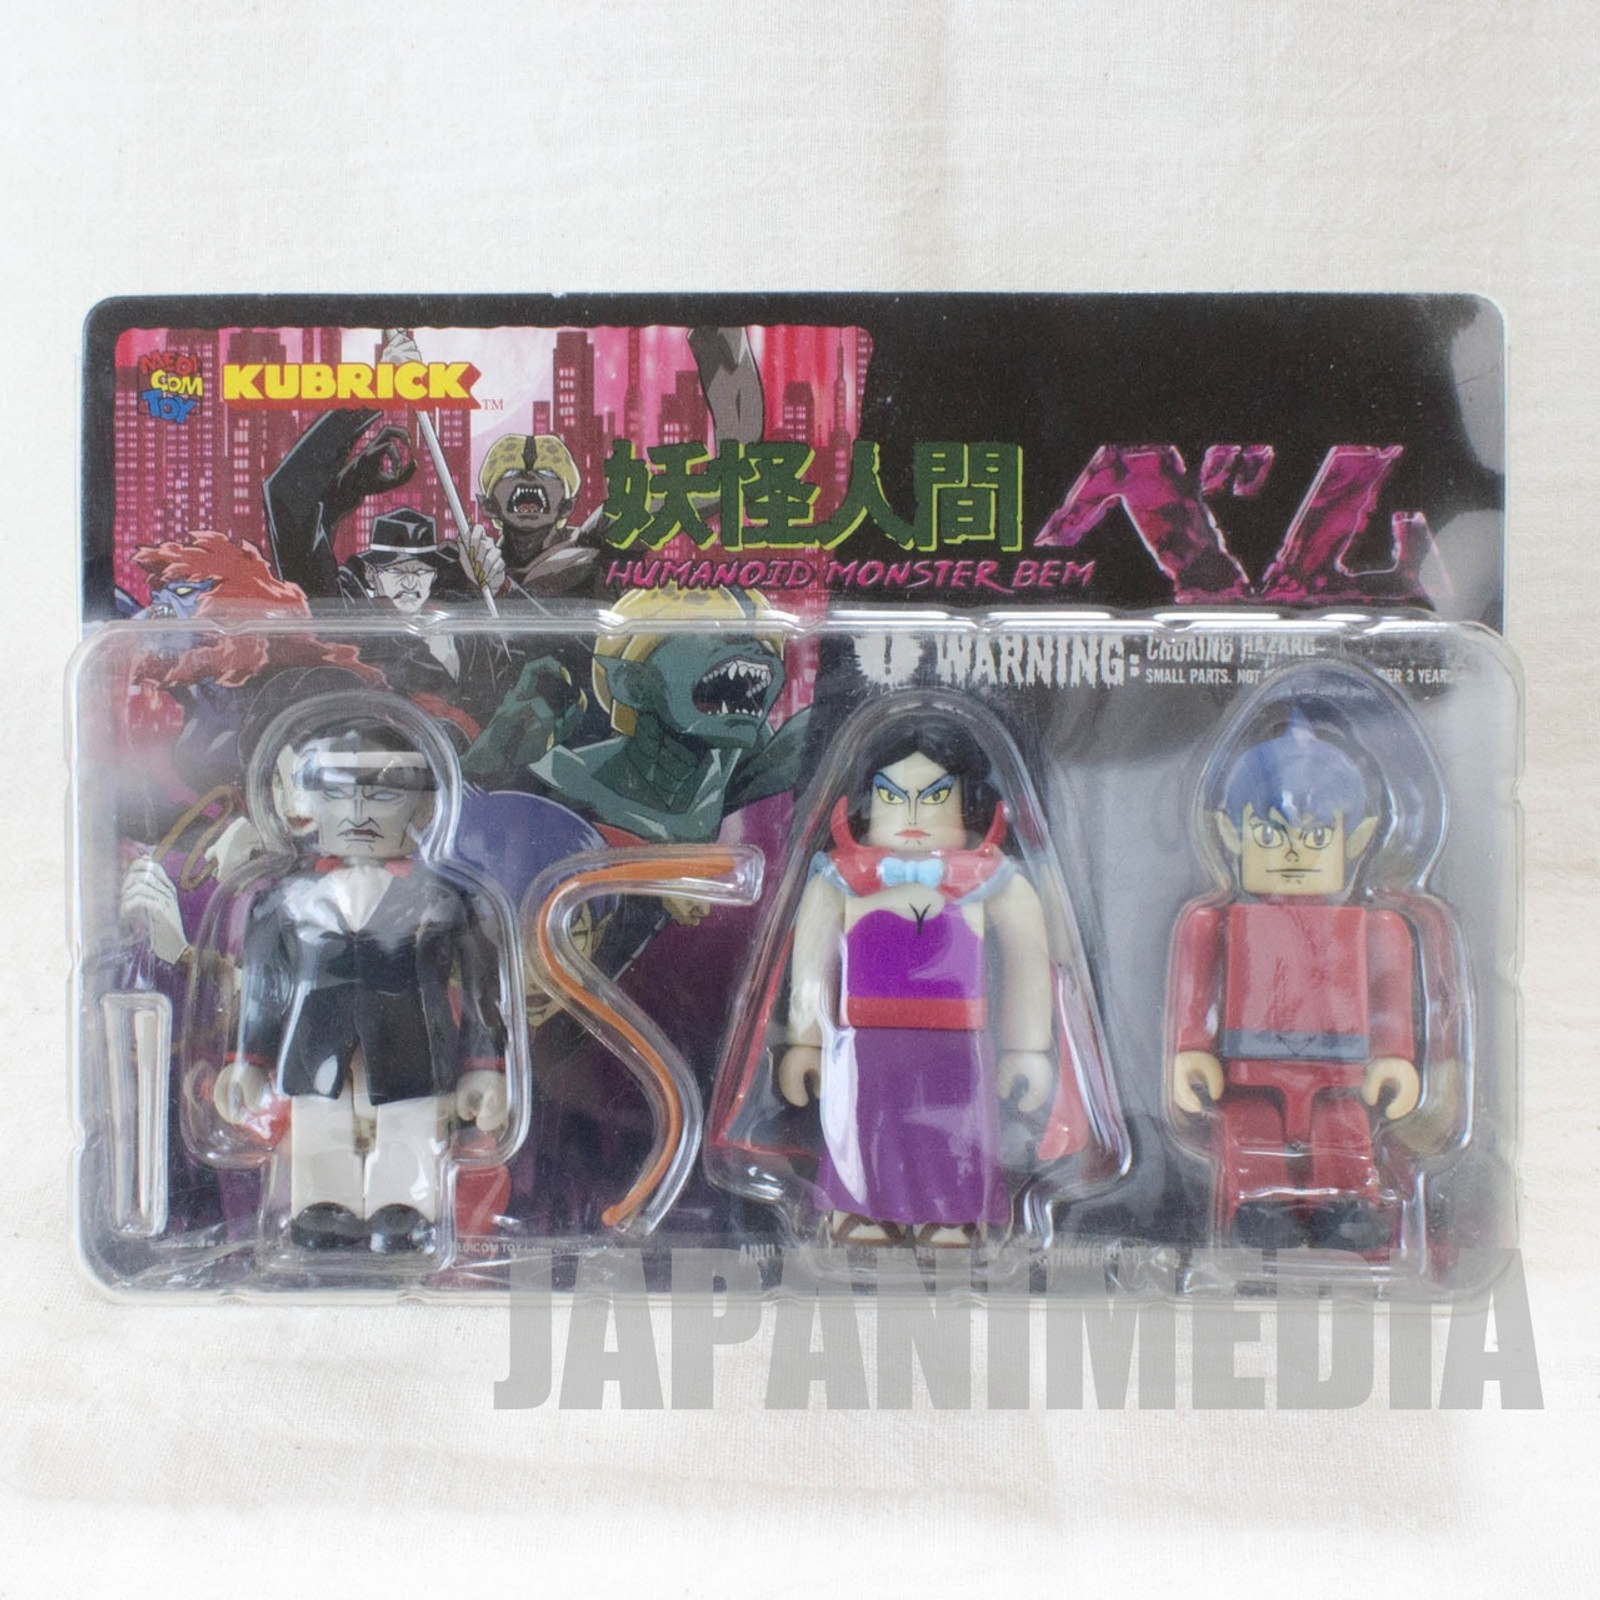 Humanoid Monster Bem Bella Belo Human Kubrick Set Figure Medicom Toy JAPAN ANIME